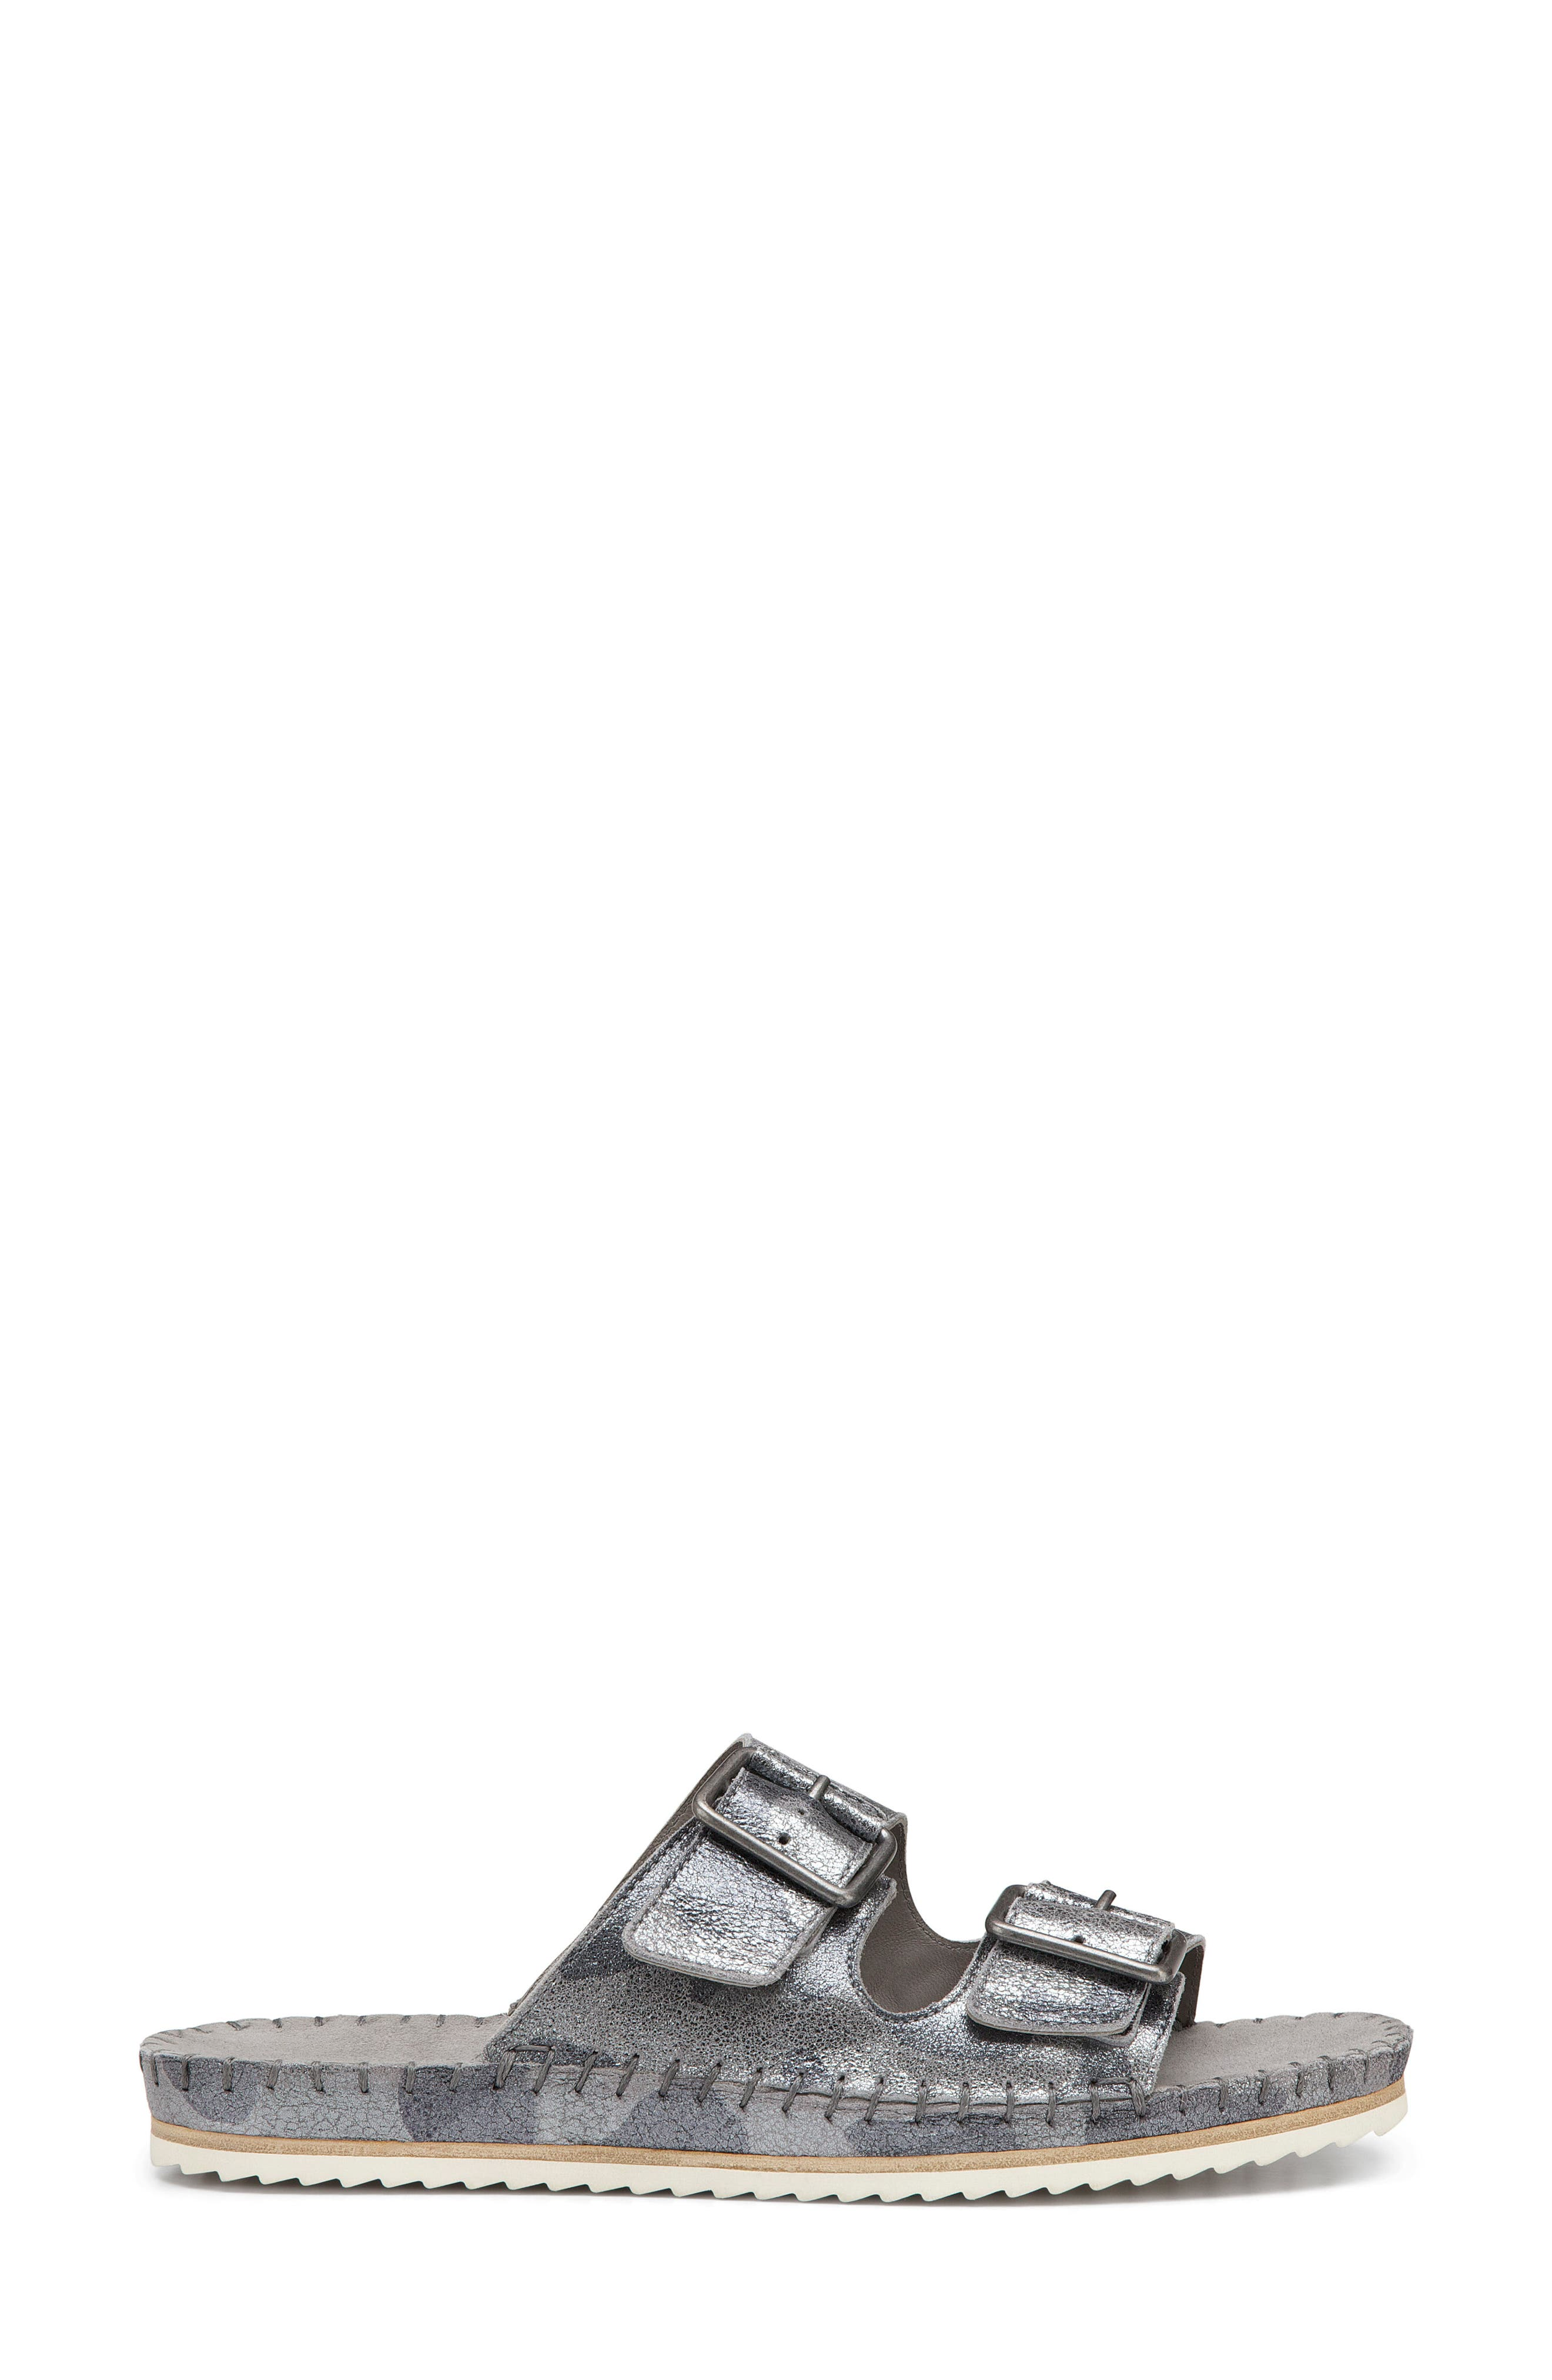 Carli Slide Sandal,                             Alternate thumbnail 4, color,                             Pewter Camo Metallic Suede